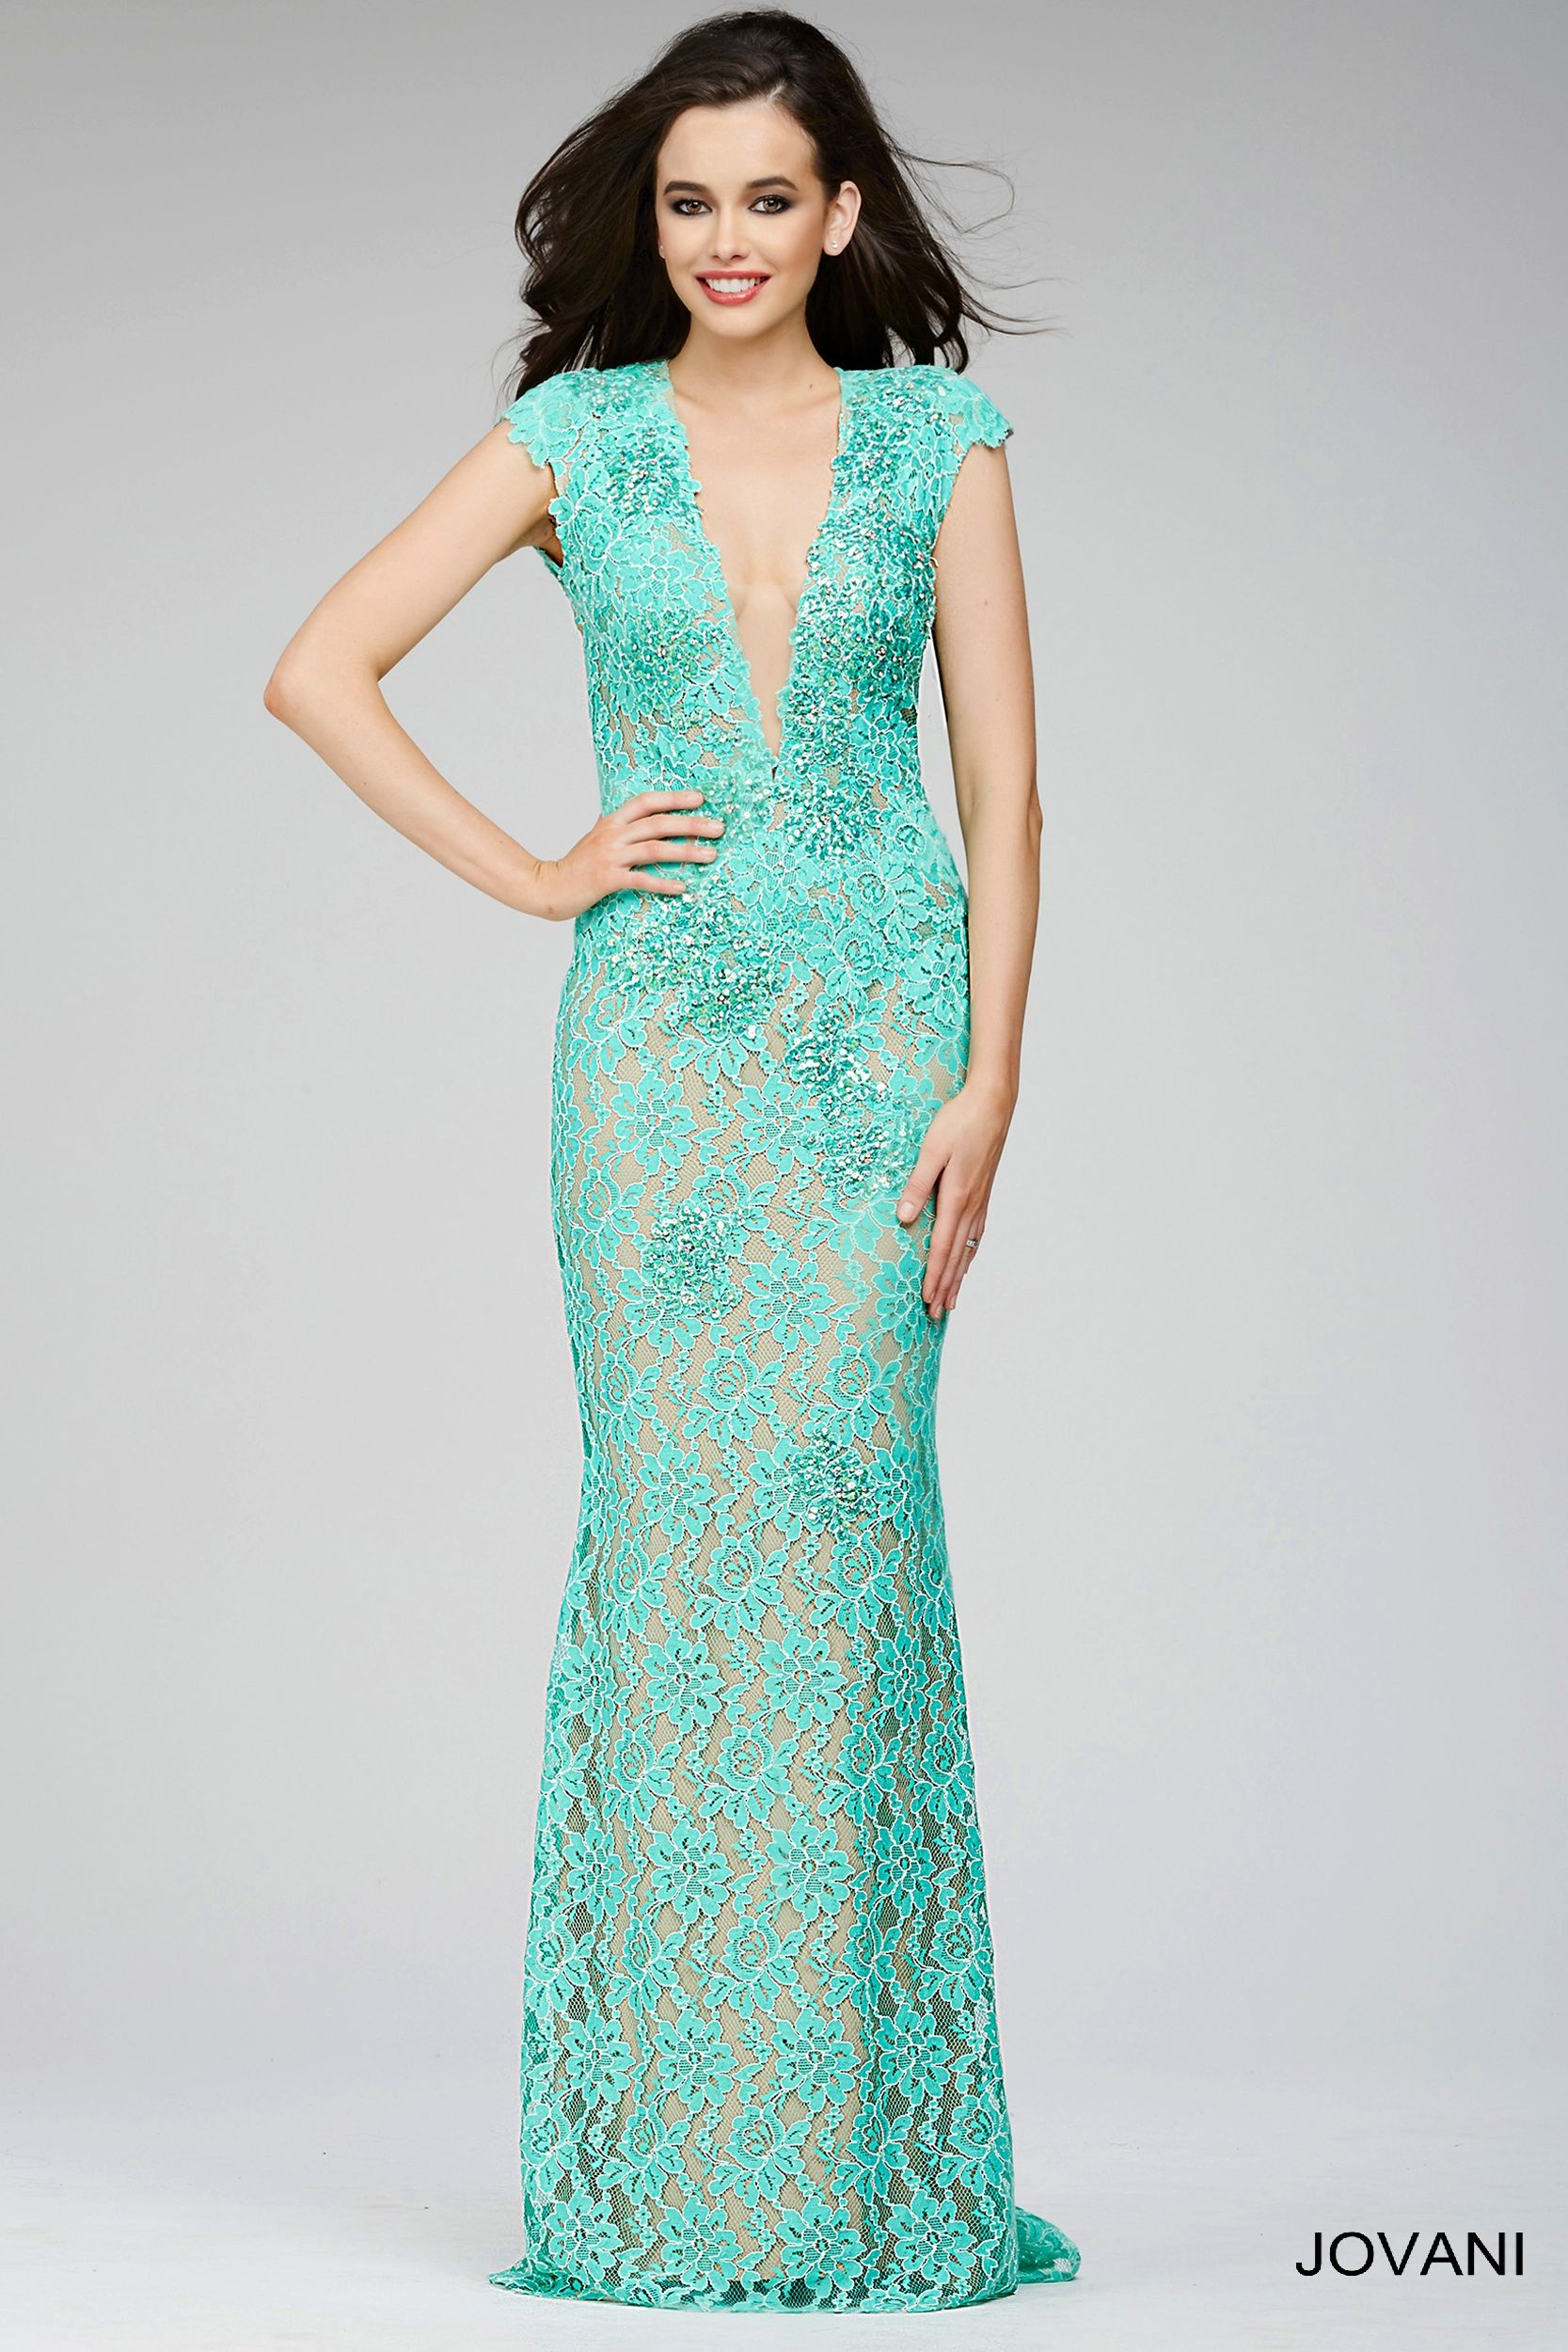 Evening dress 26342 | Prom dresses long | Pinterest | Prom, Calming ...